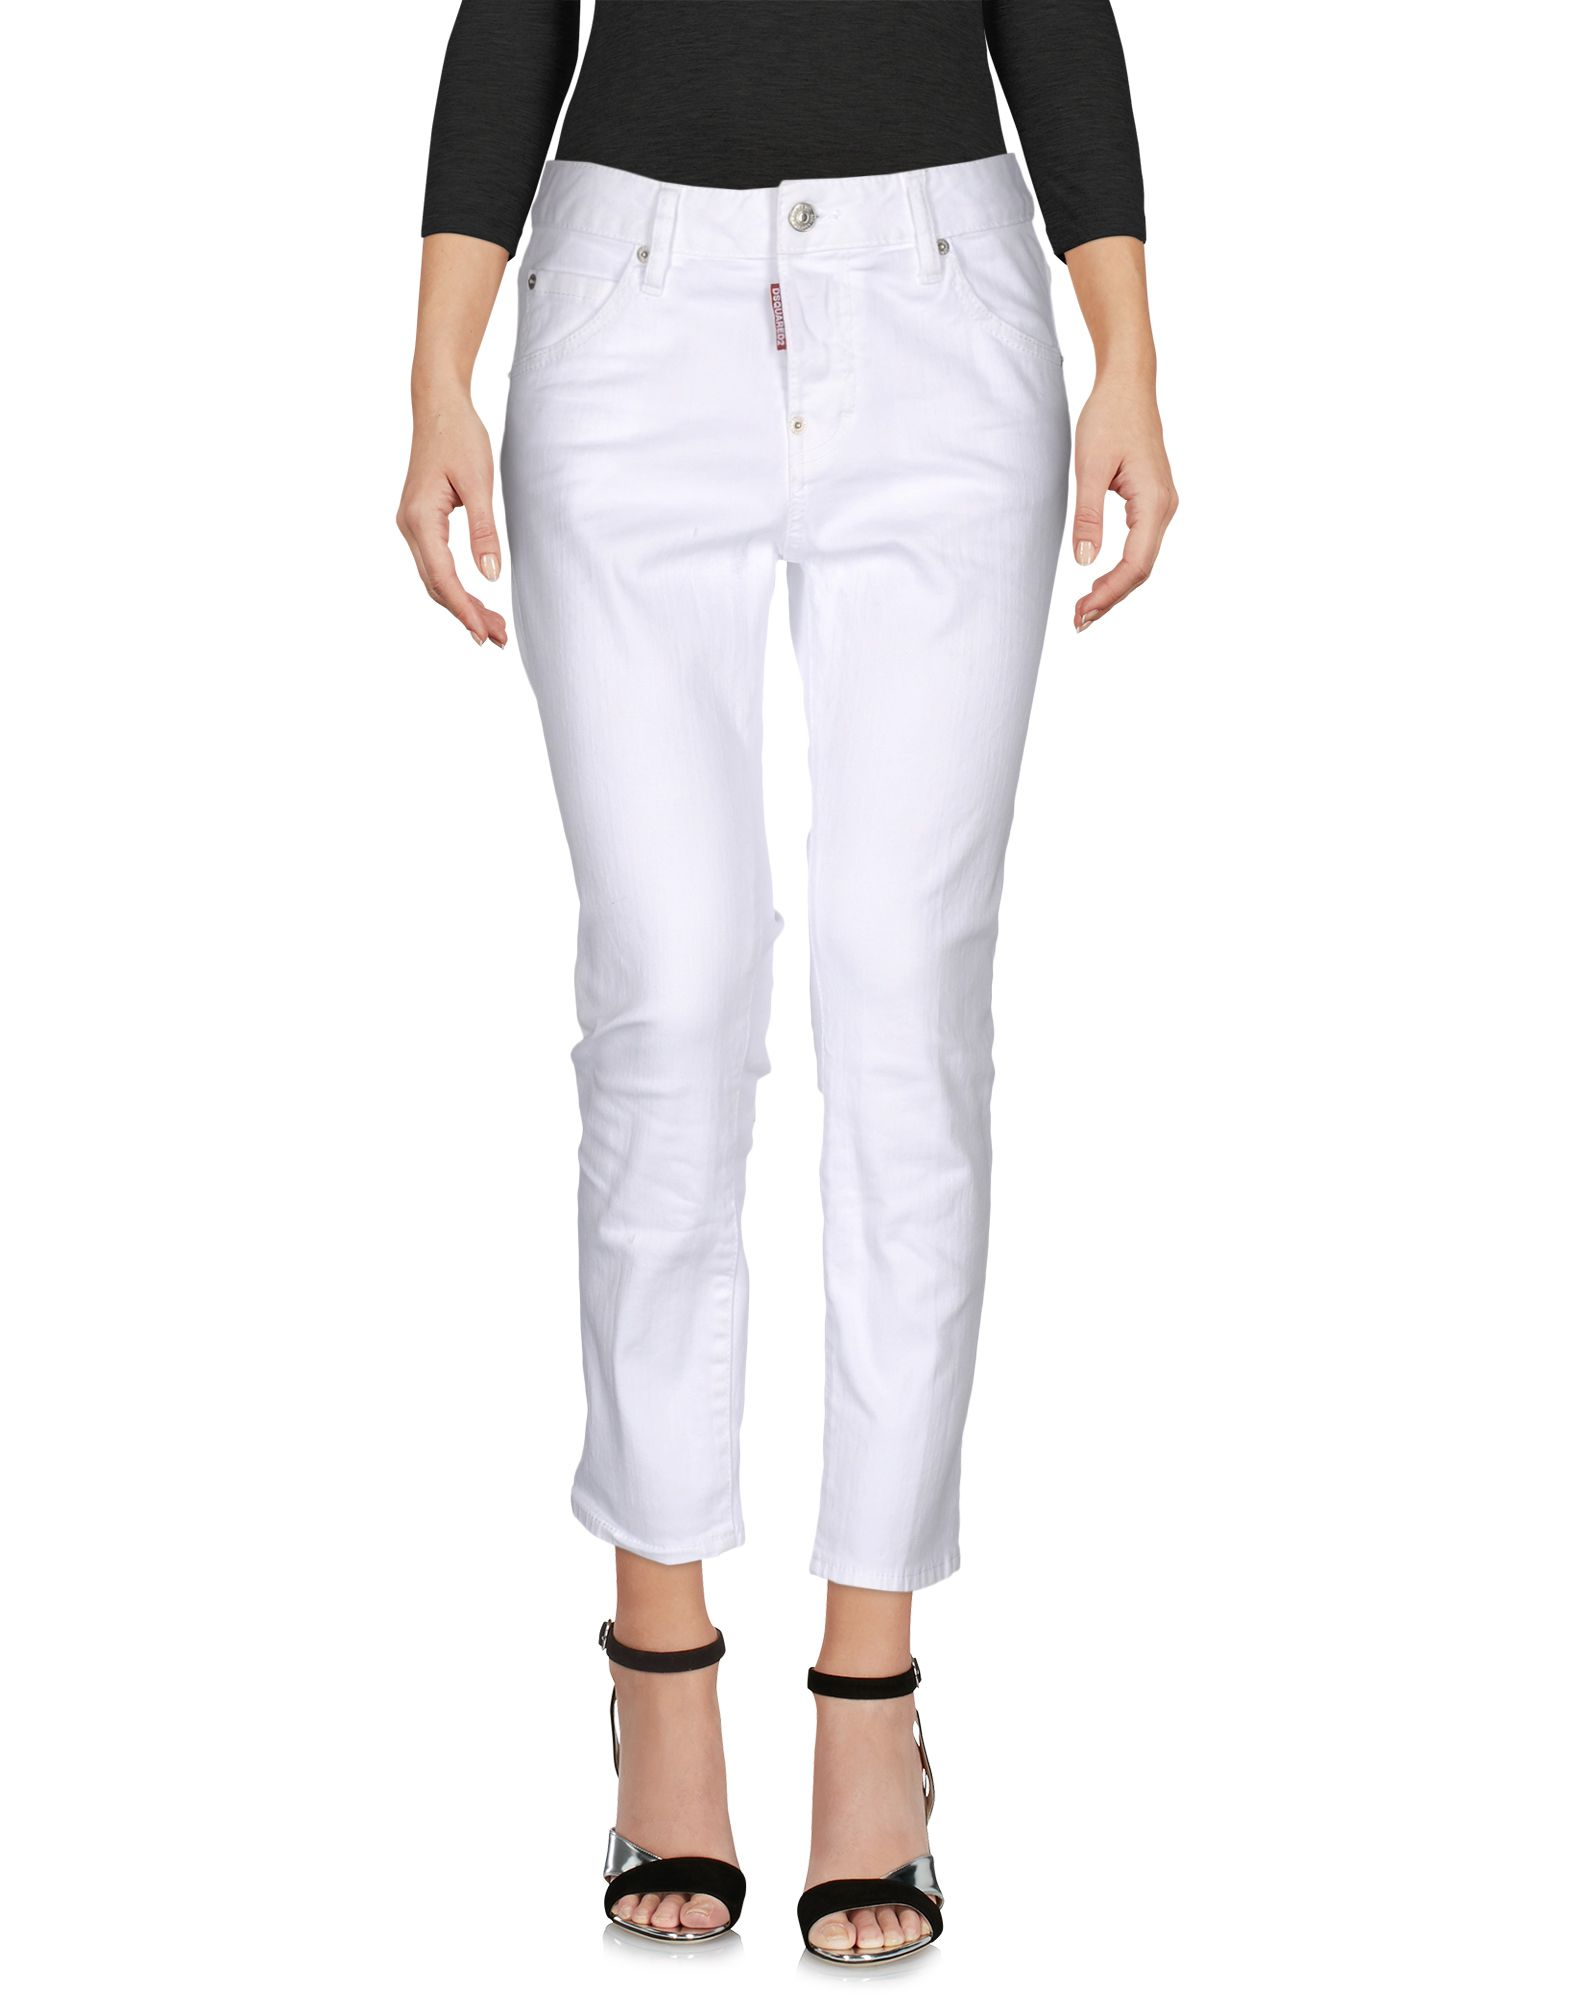 Pantaloni Jeans Dsquared2 Donna - Acquista online su 6pFpvVXk